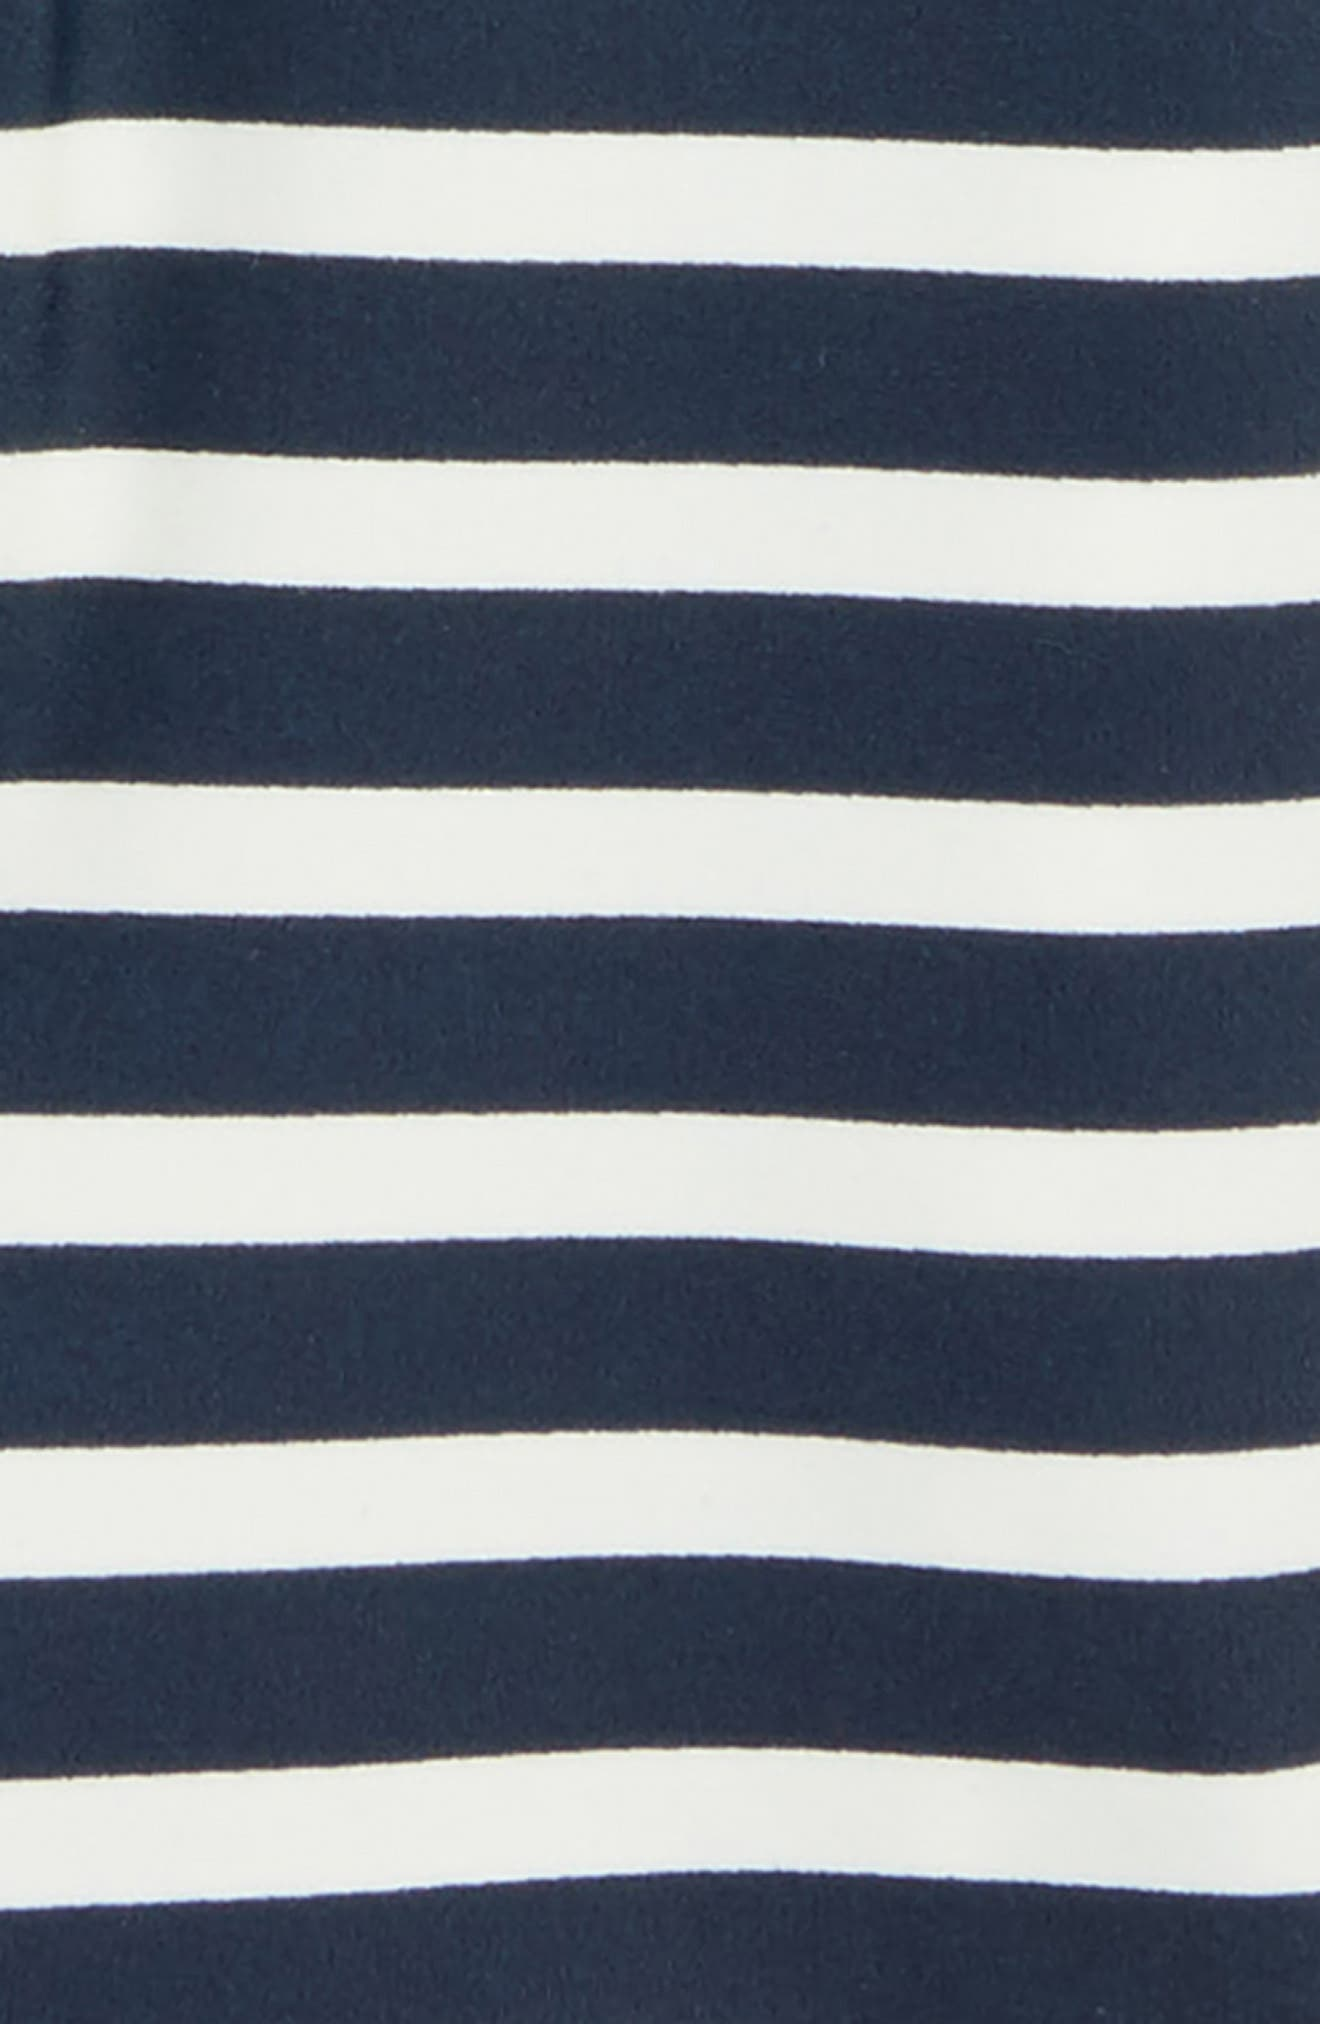 Stripe One-Piece Rashguard Swimsuit,                             Alternate thumbnail 2, color,                             Indigo 2-Color Stripe